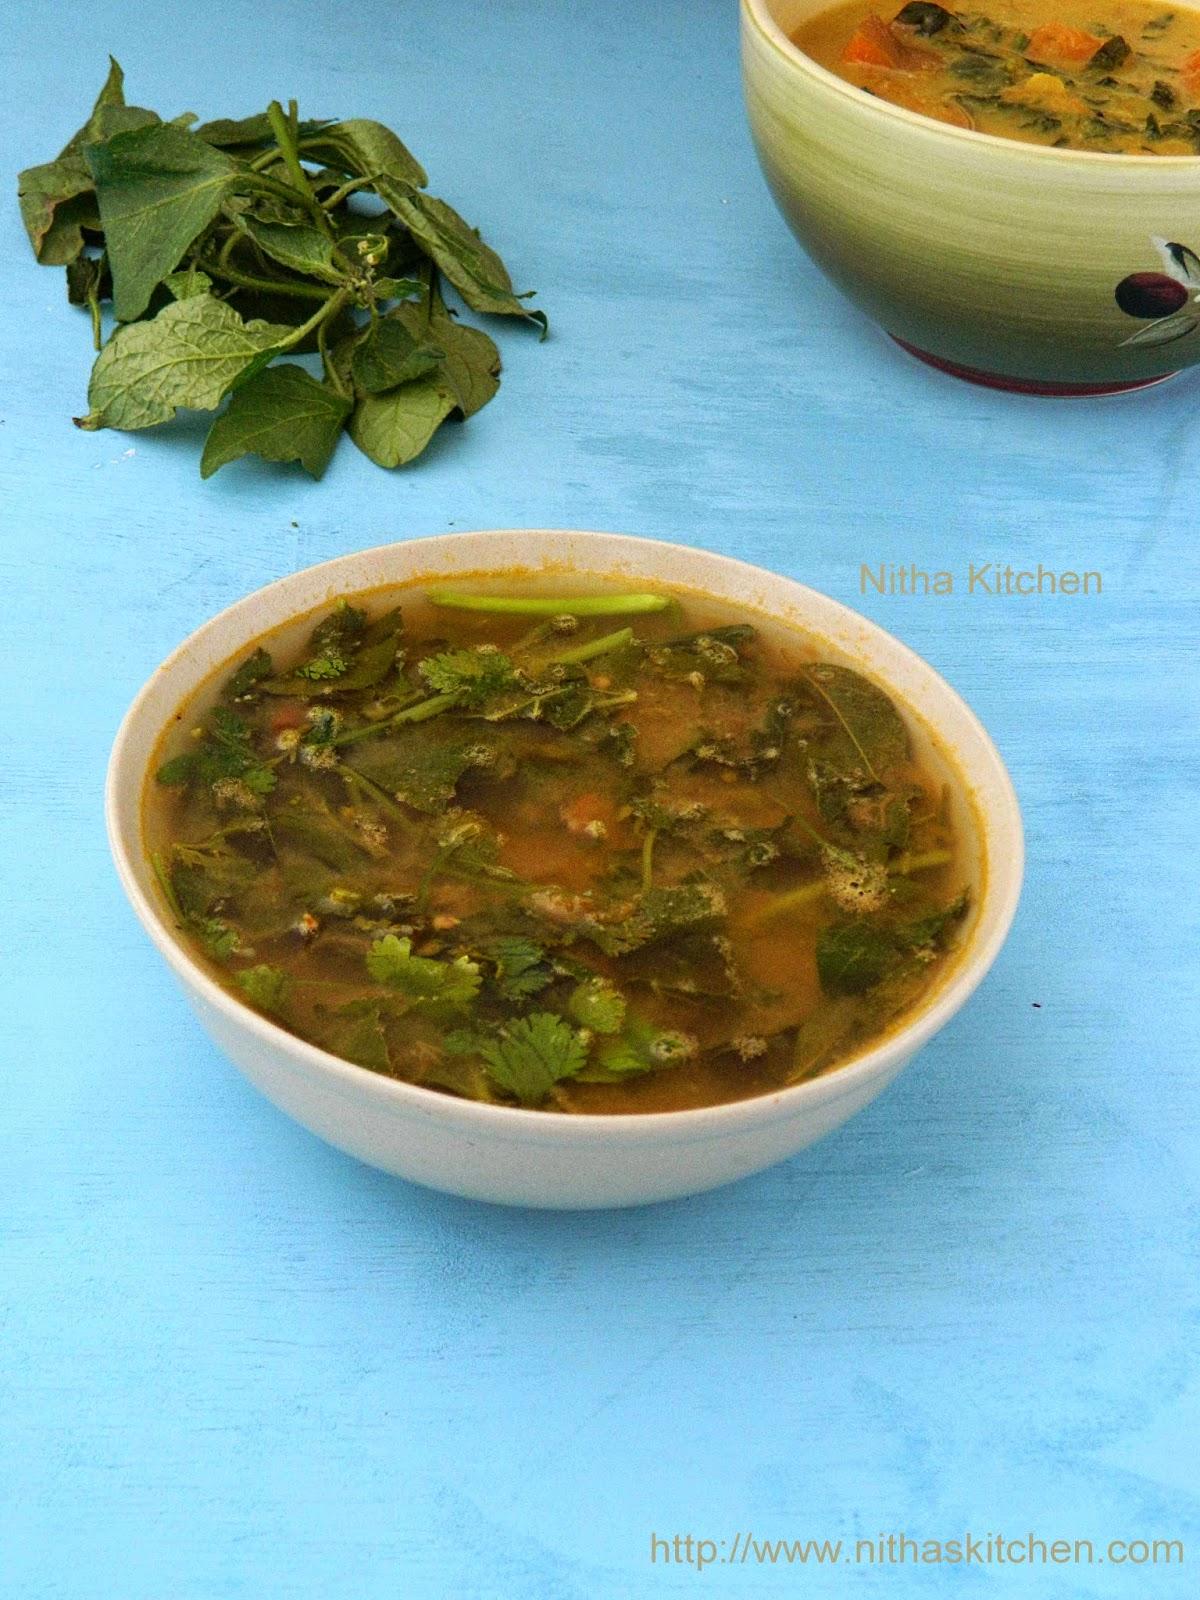 Nitha Kitchen: Healthy Recipes